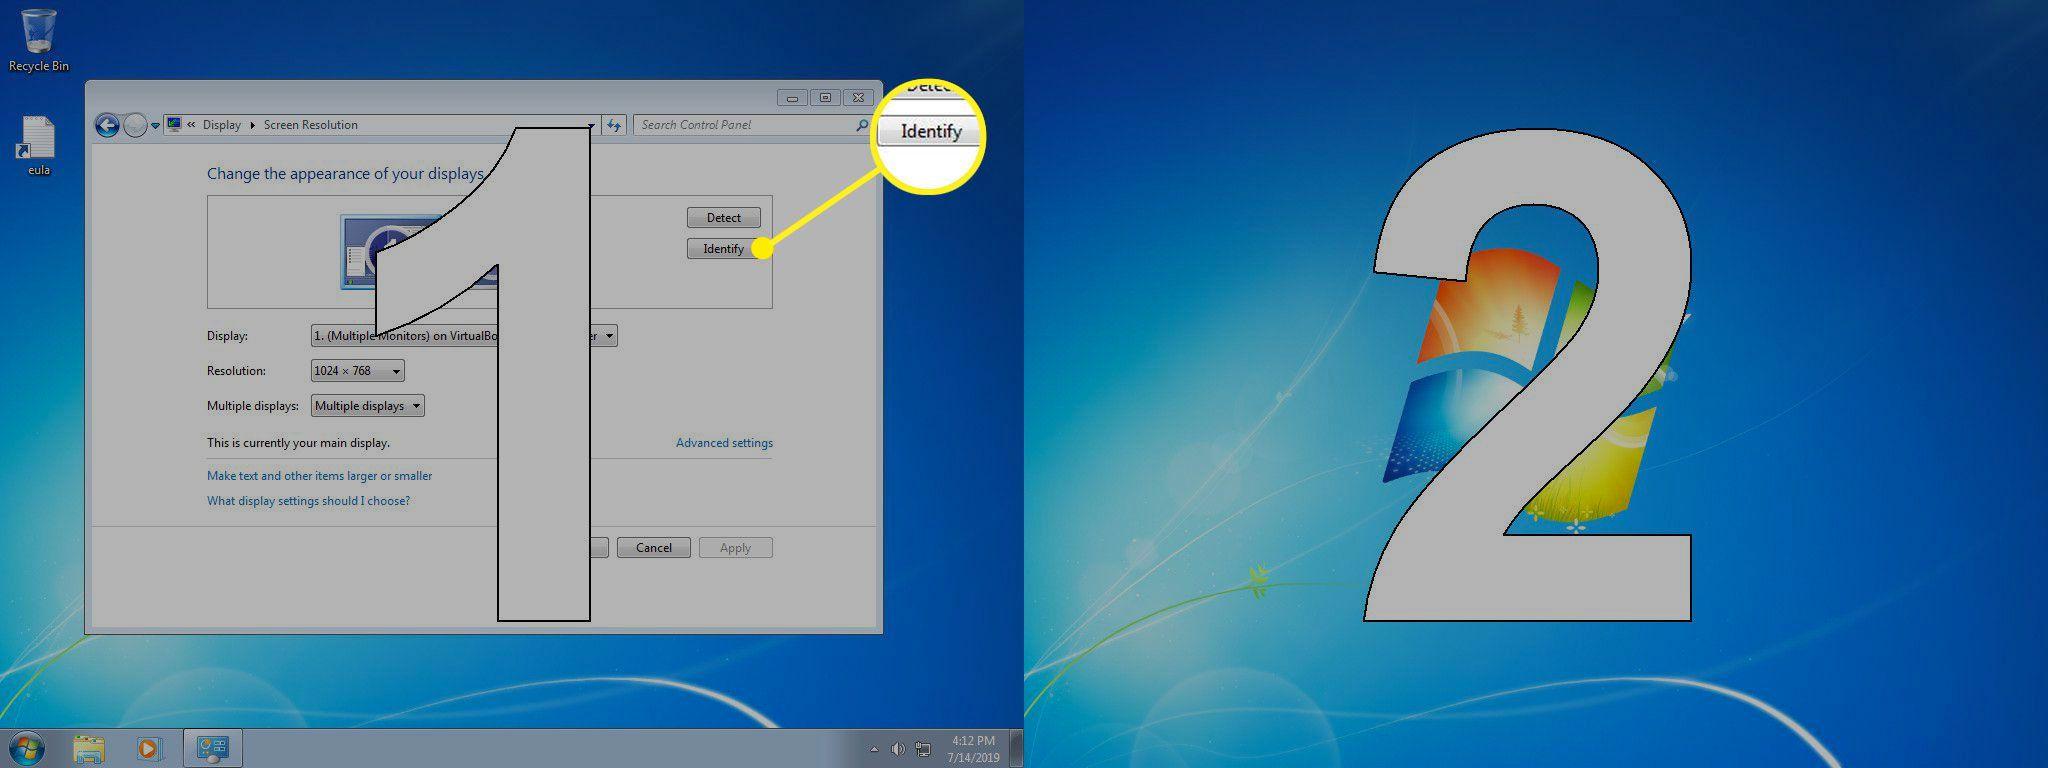 Identify button in Windows resolution settings